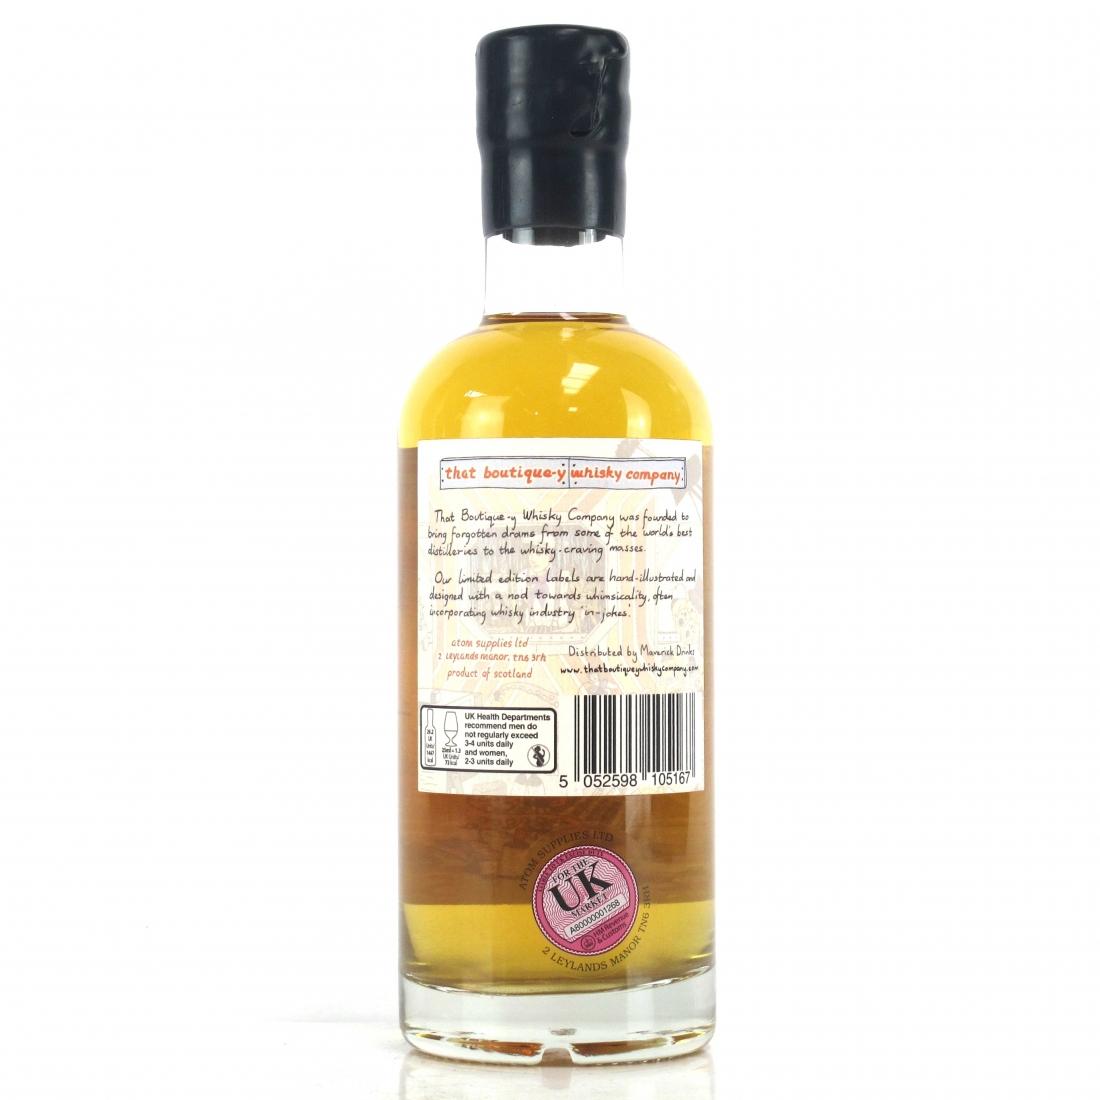 Bruichladdich That Boutique-y Whisky Company 12 Year Old Batch #3